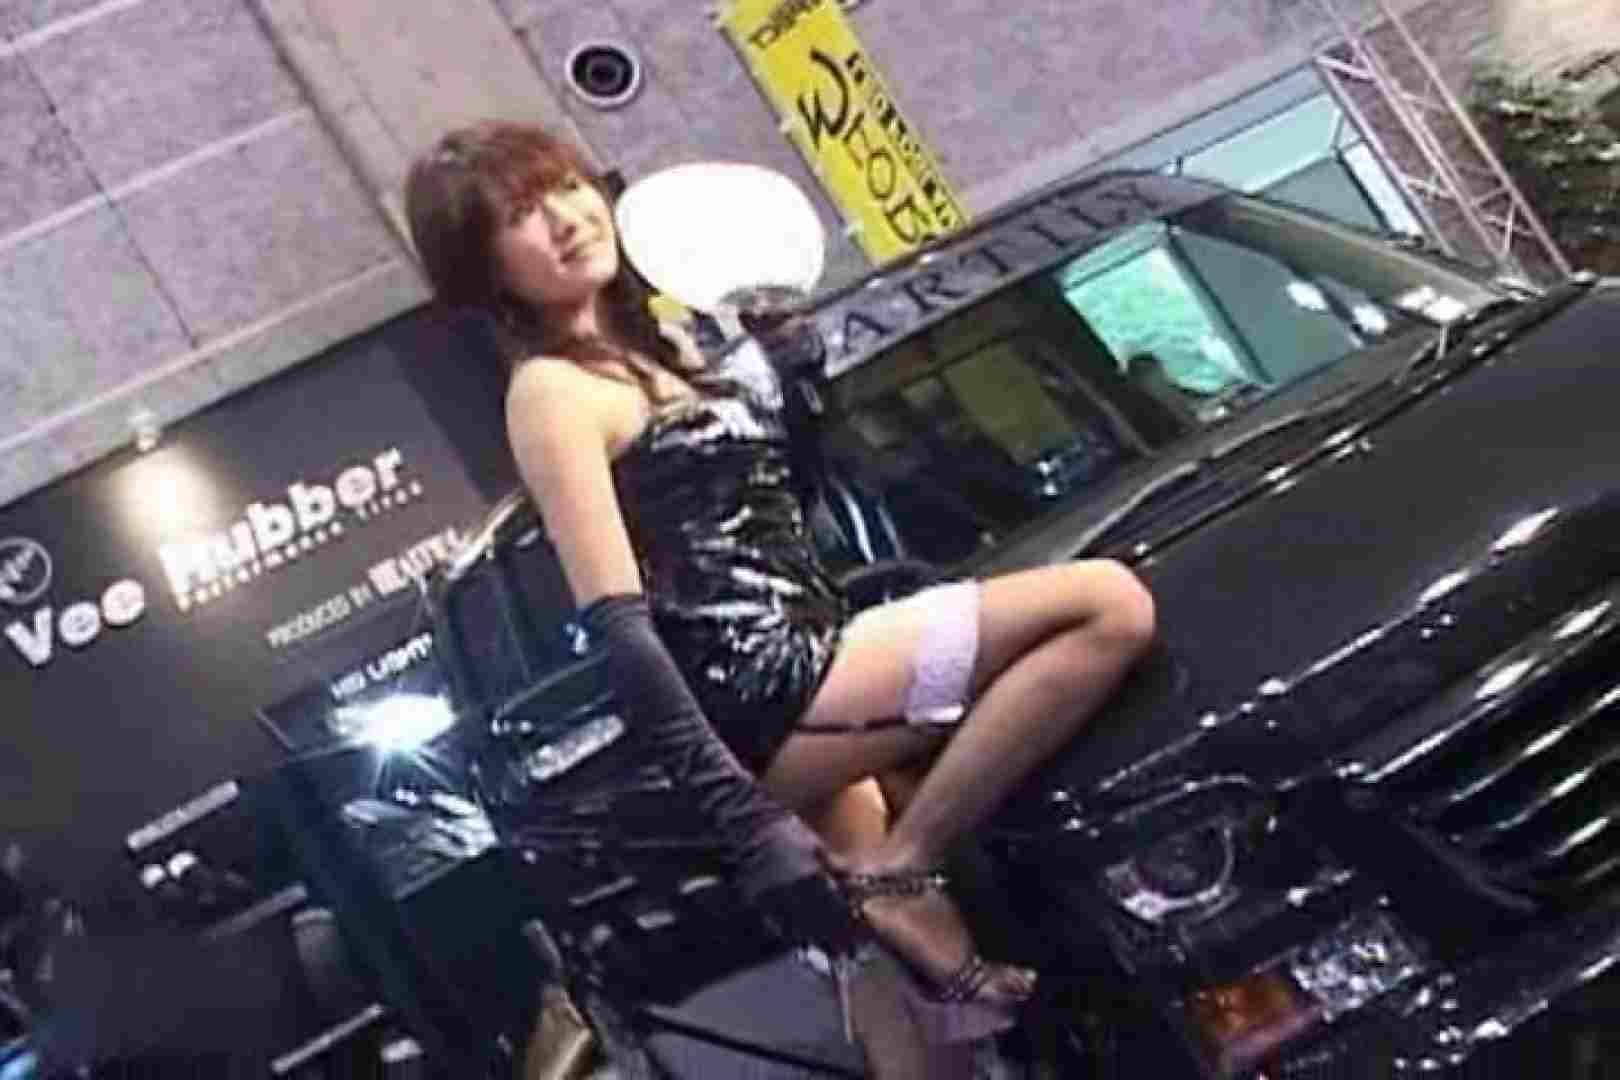 RQカメラ地獄Vol.36 チラ オマンコ無修正動画無料 89pic 78